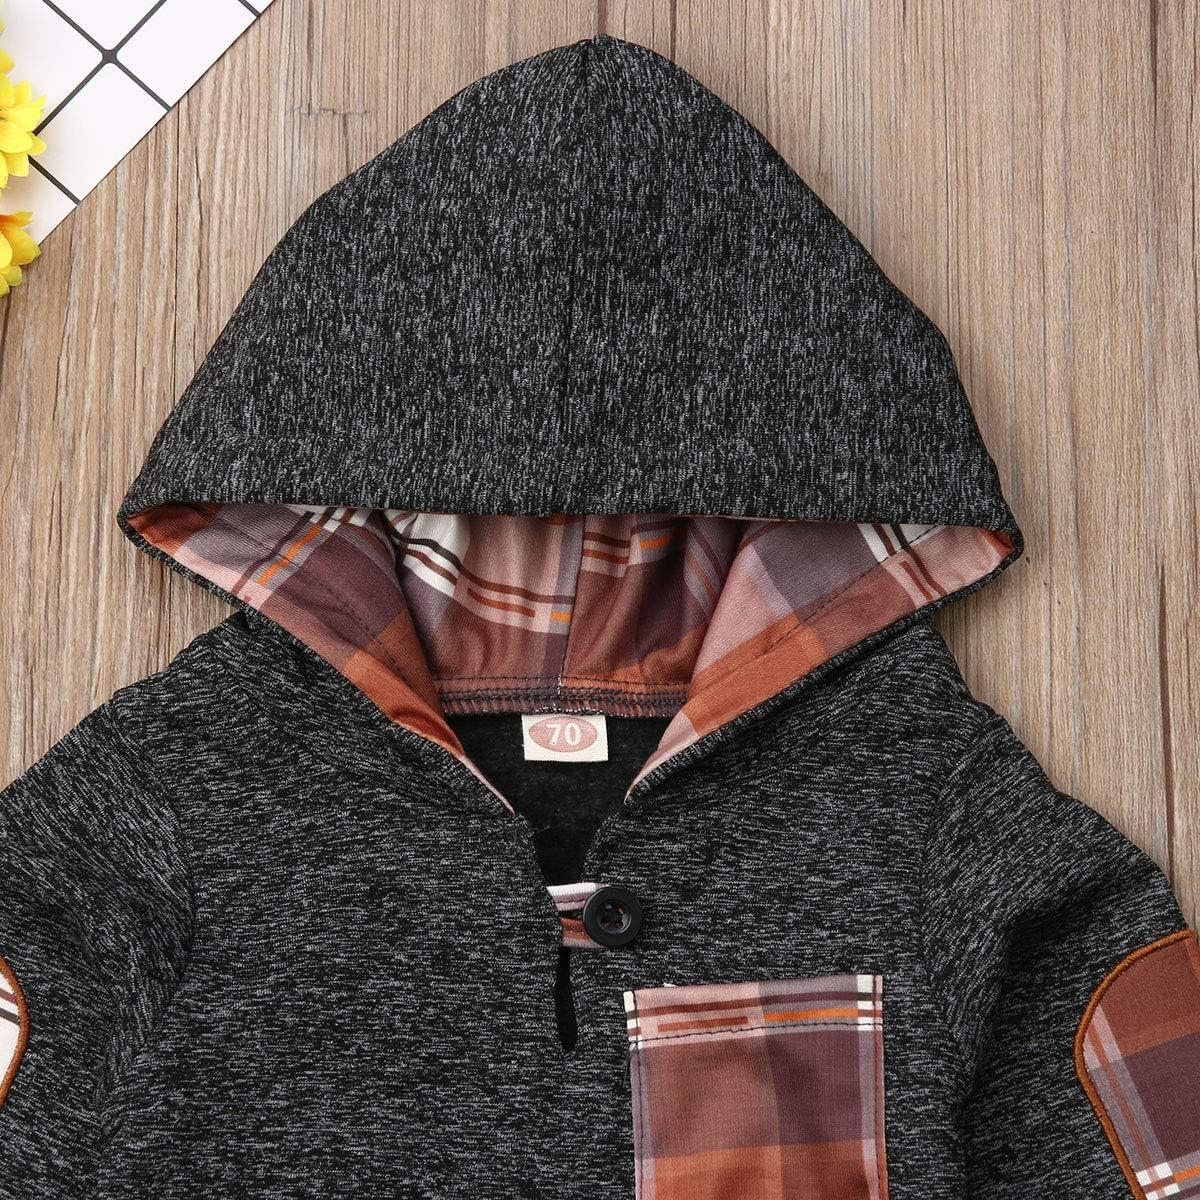 2Pcs Baby Boys Hoodie Tops Pants Set Dinosaur Deer Print Sweatsuit Fall Winter Outfits